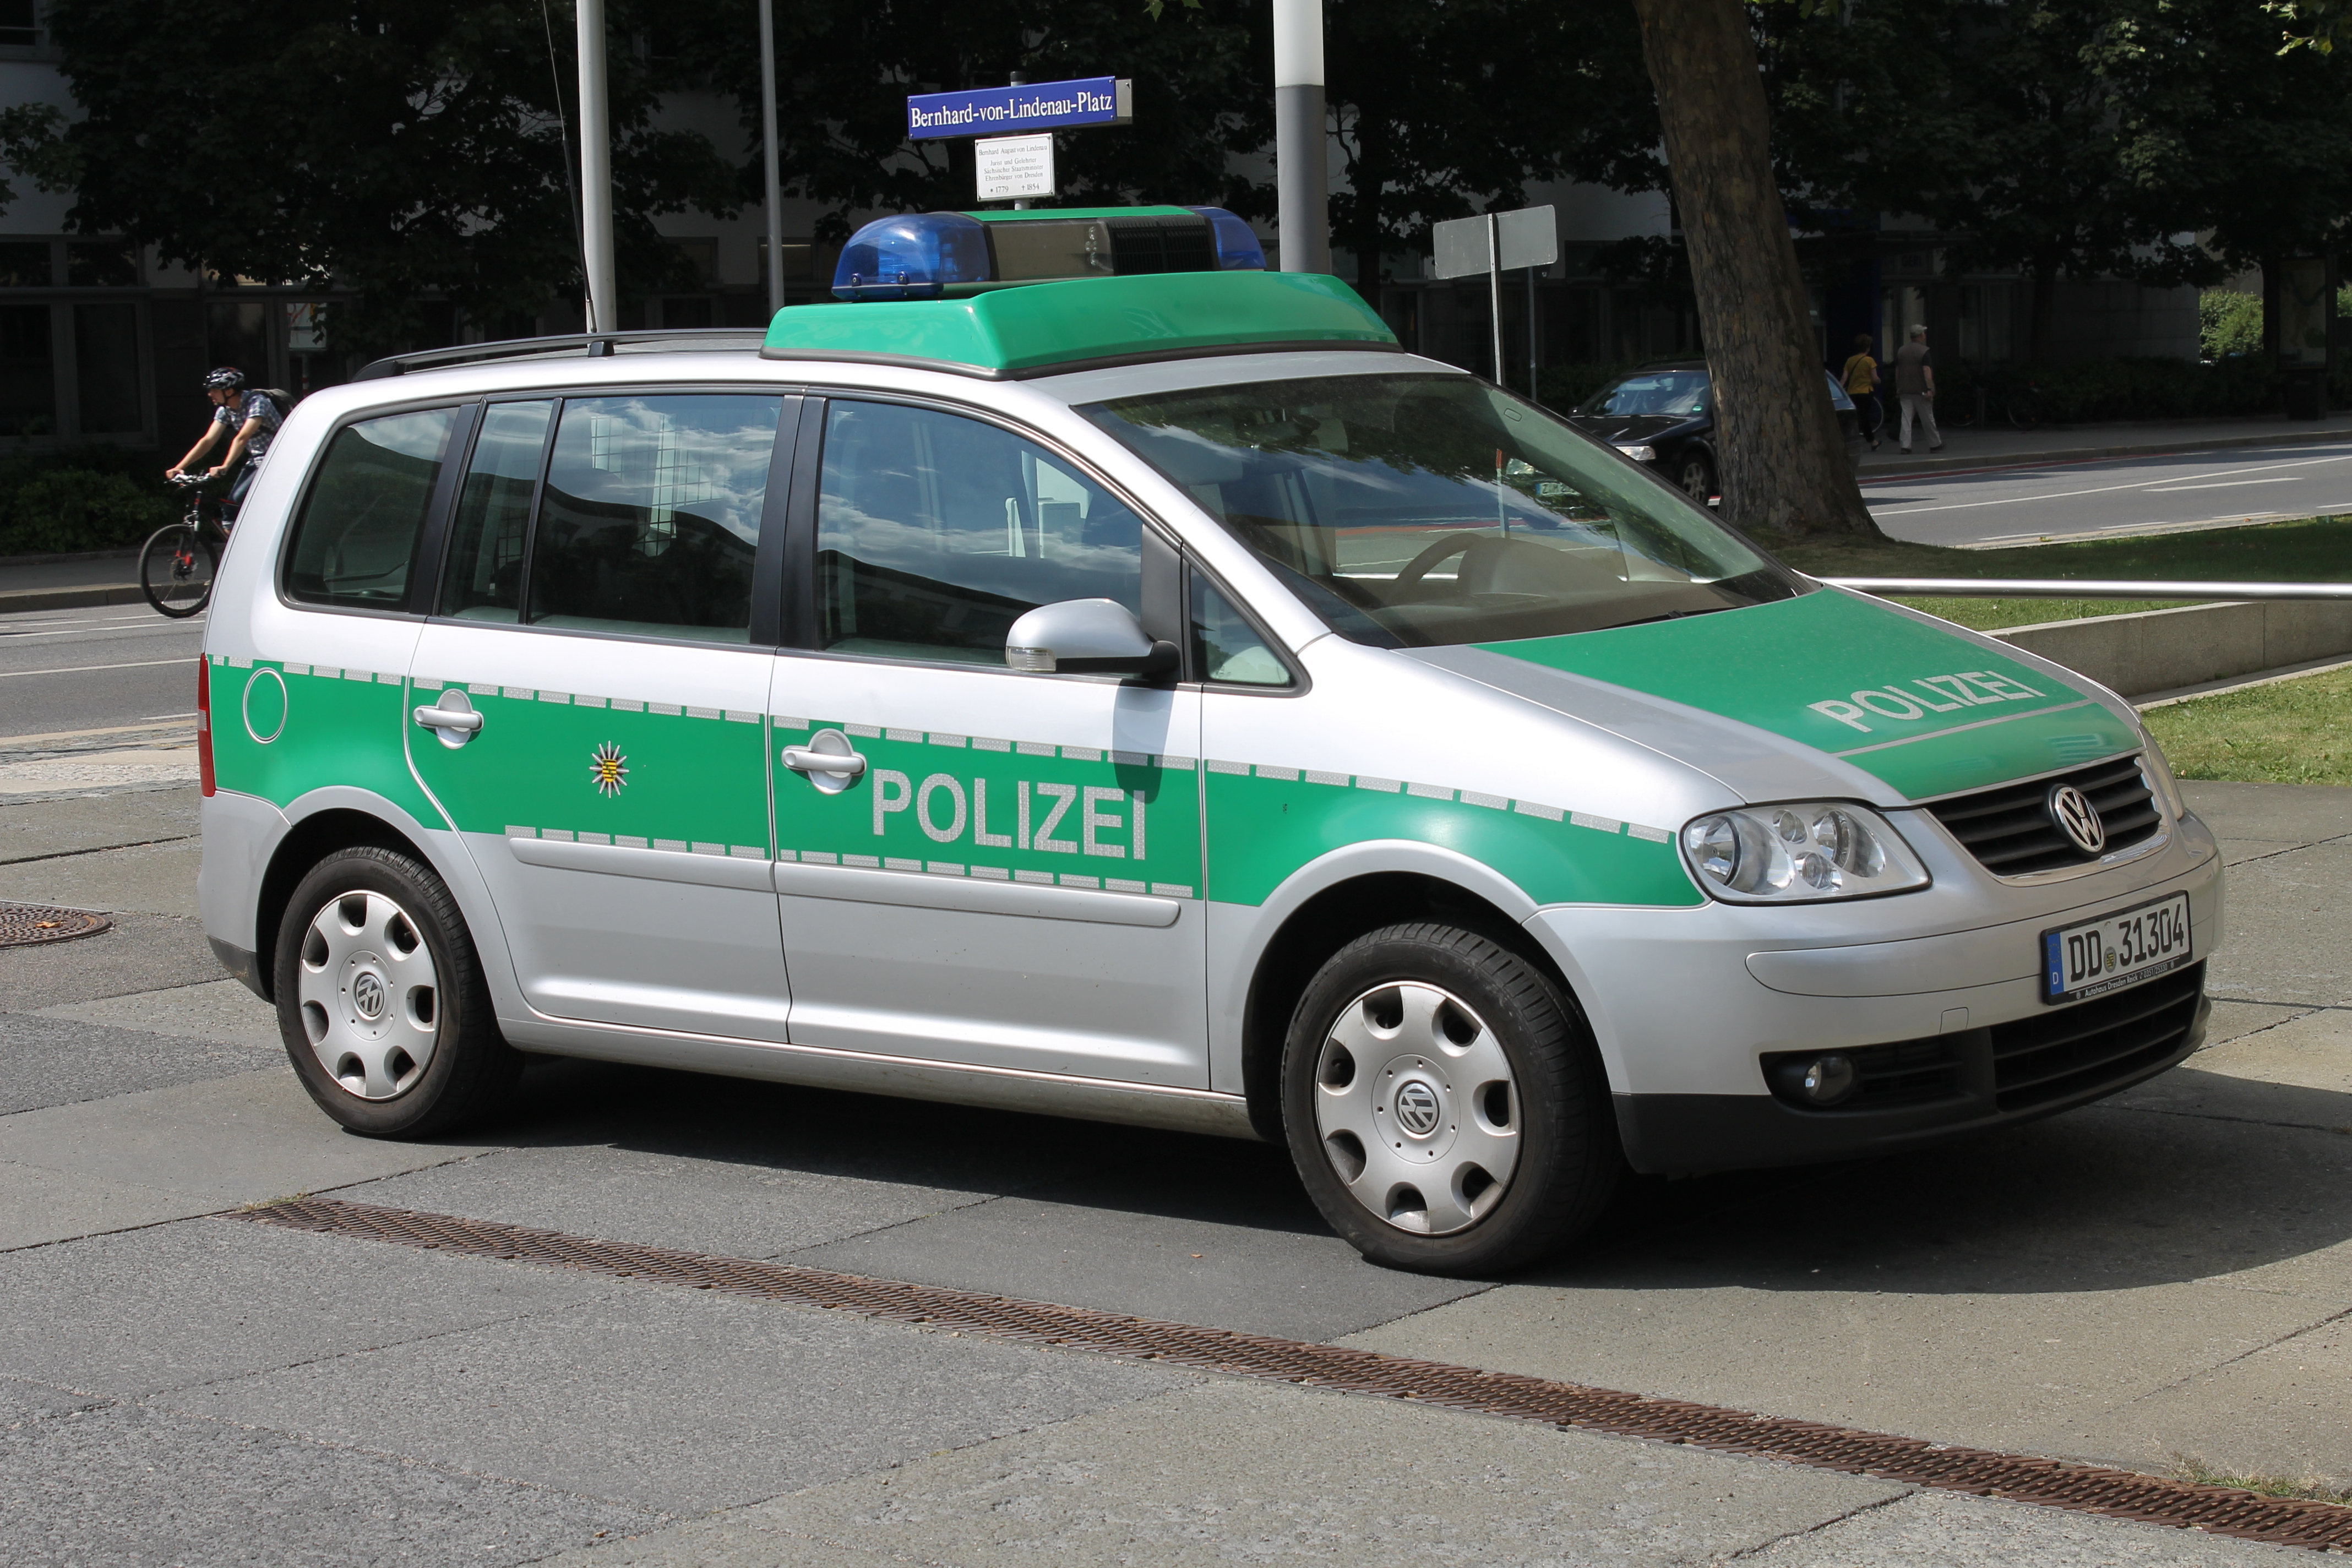 Cars Under 800 >> File:Polizeiauto Dresden.jpg - Wikimedia Commons